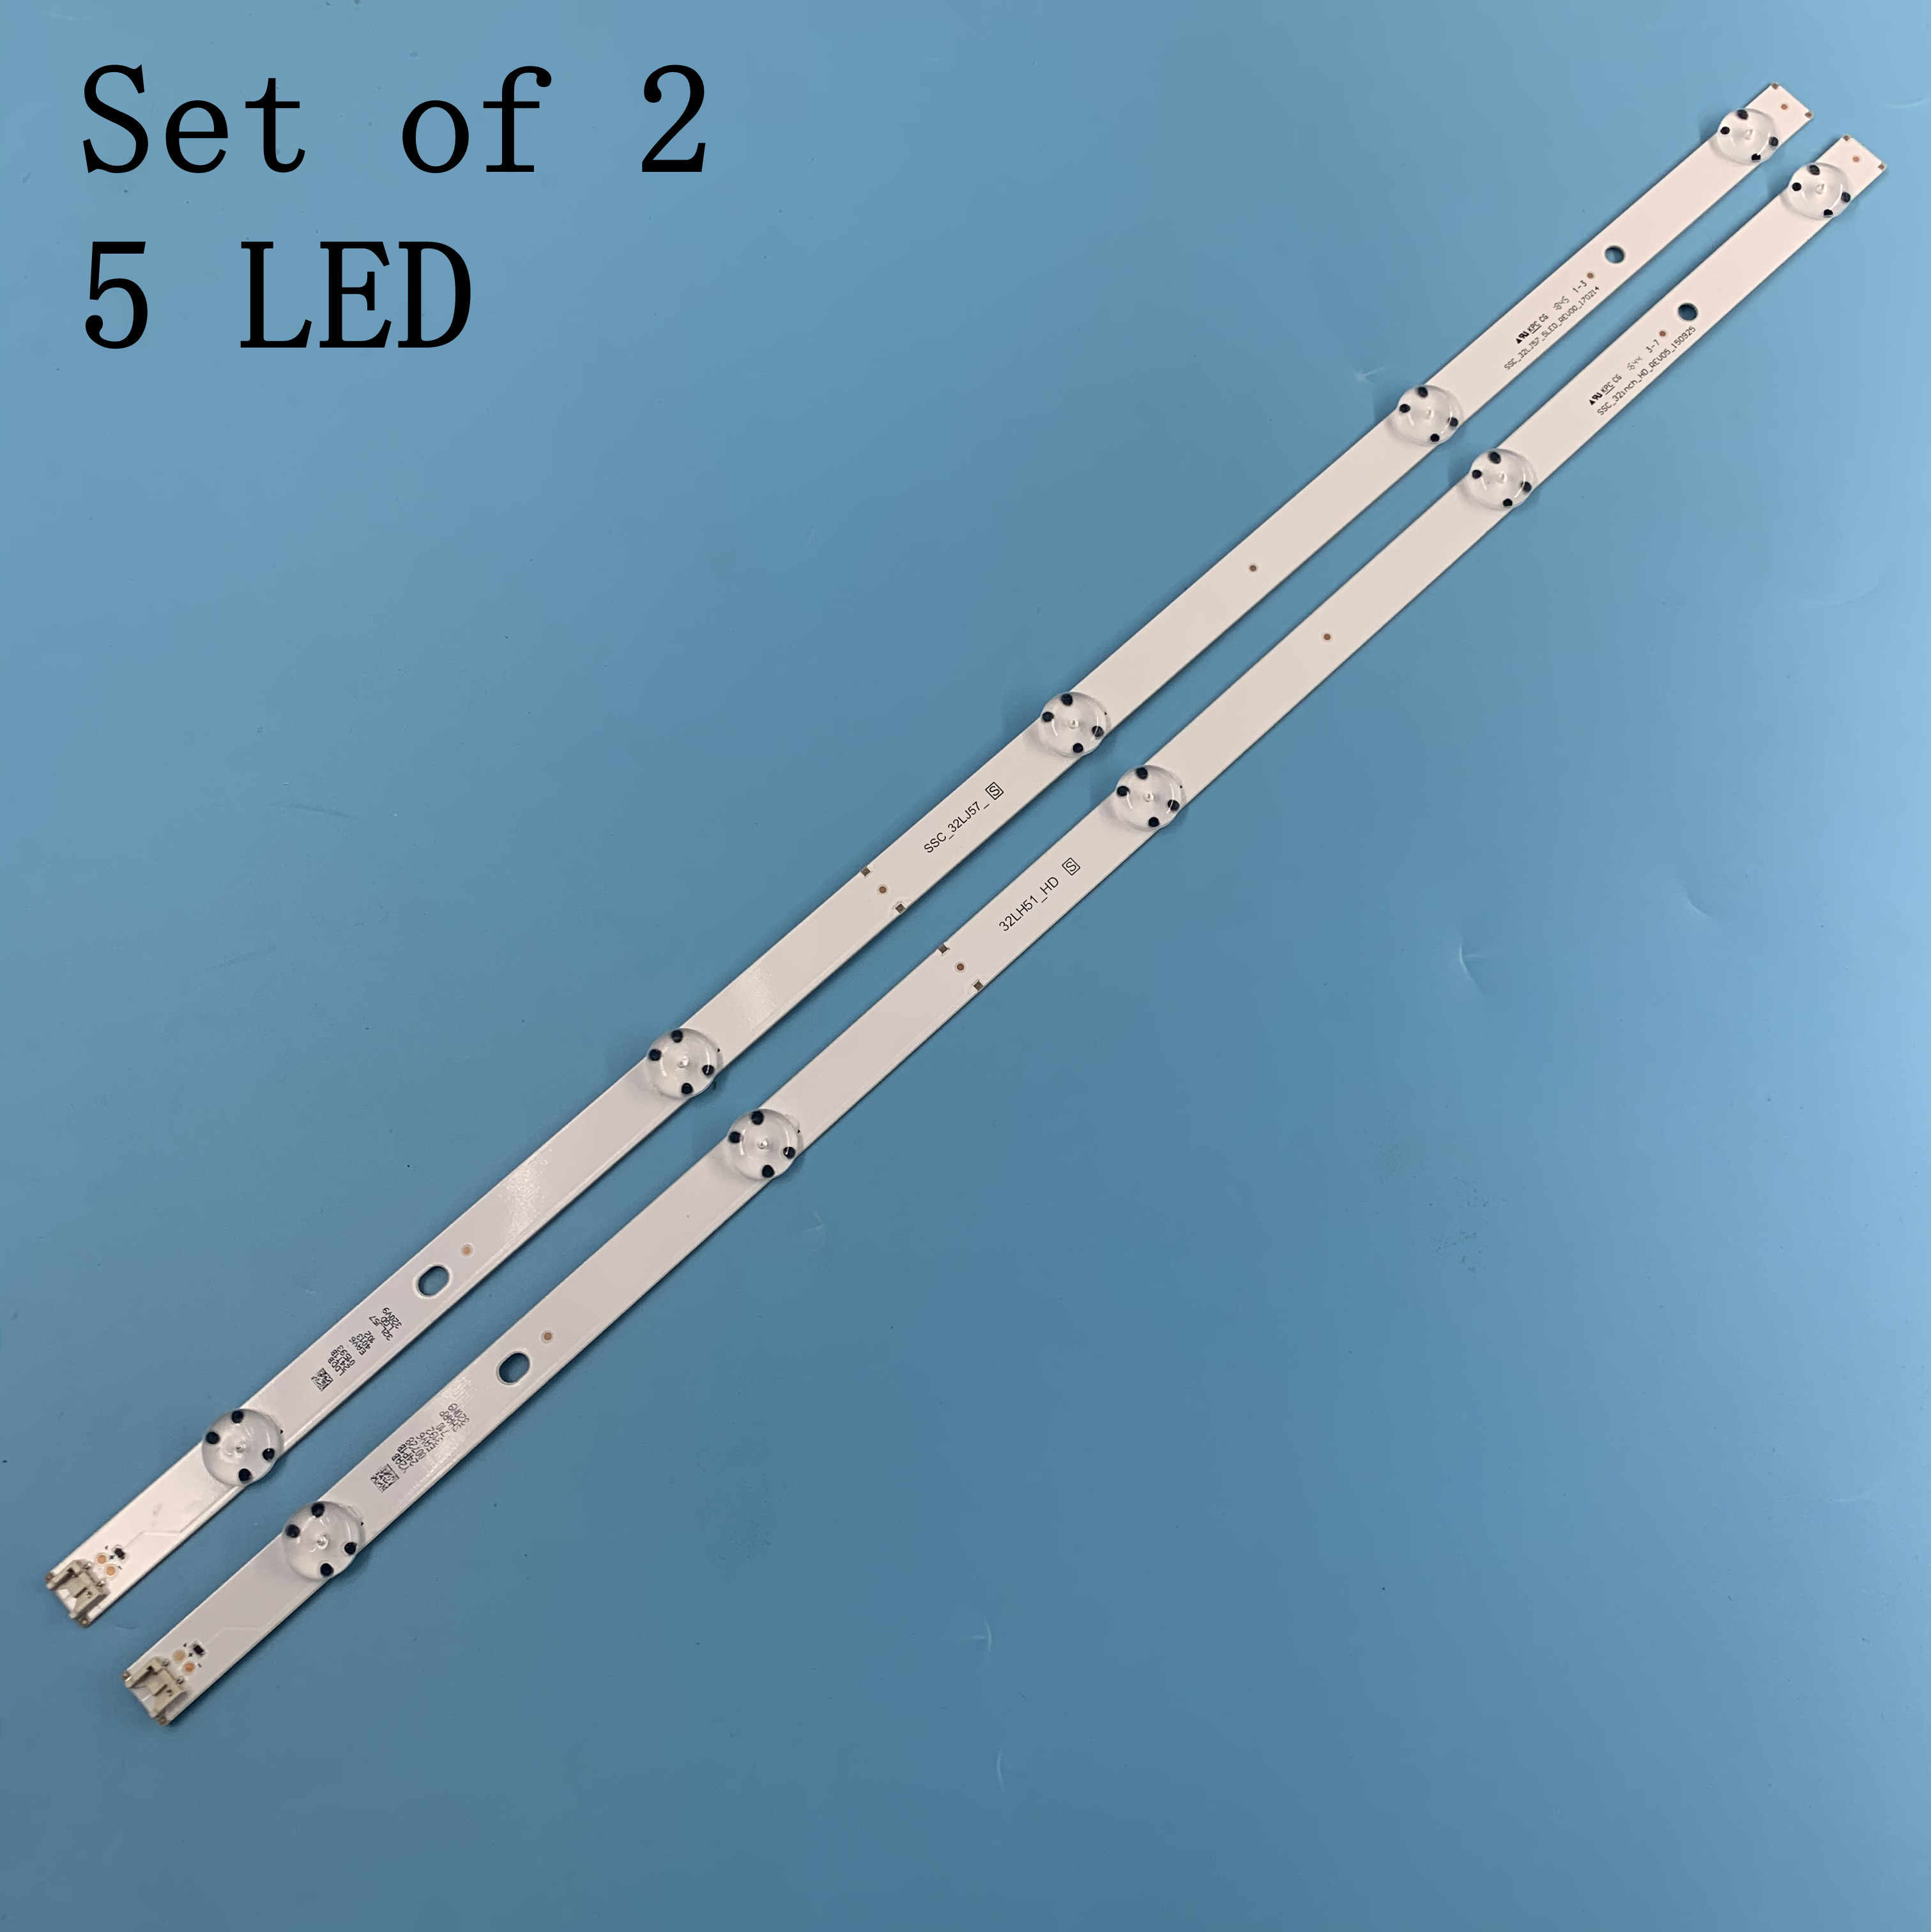 "LED תאורה אחורית רצועת 5 מנורת עבור LG 32 ""טלוויזיה Innotek ישיר 15.5Y 32 אינץ Rev0.0 _ 160323 32LH590U CSP rev0.5 Rev0.4 DH_LF51 32LH51_HD"